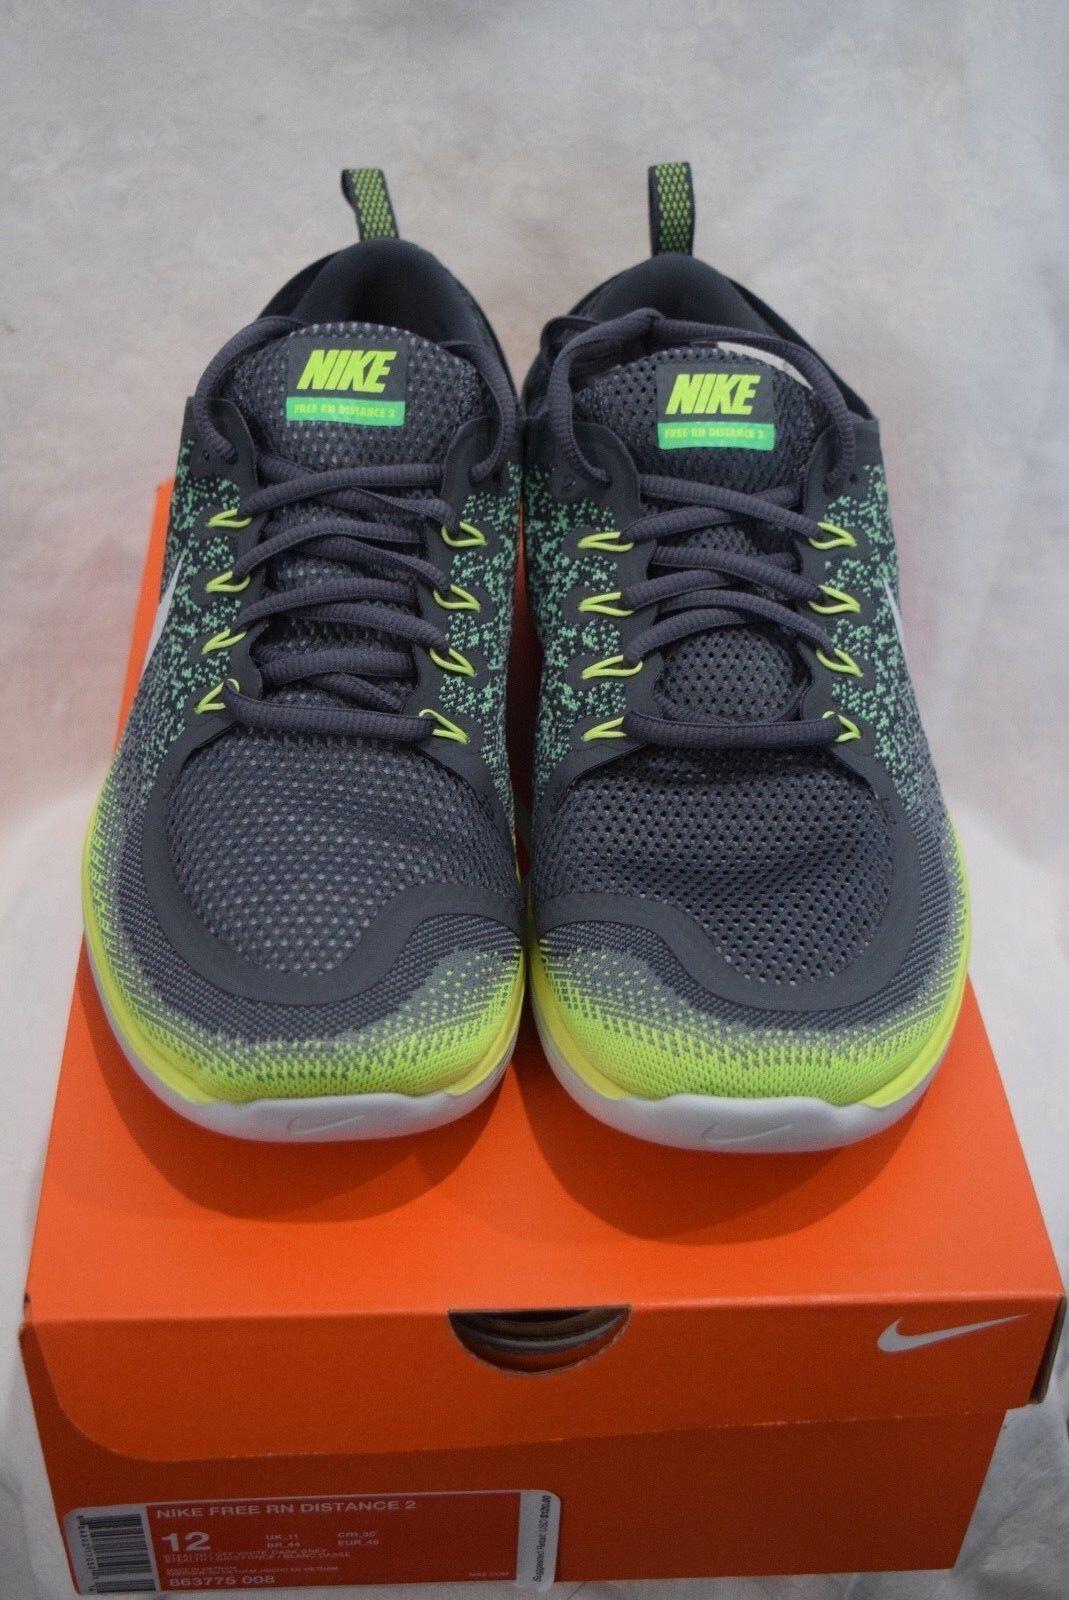 NIB  Nike Men's Free Run Distance 2 shoes